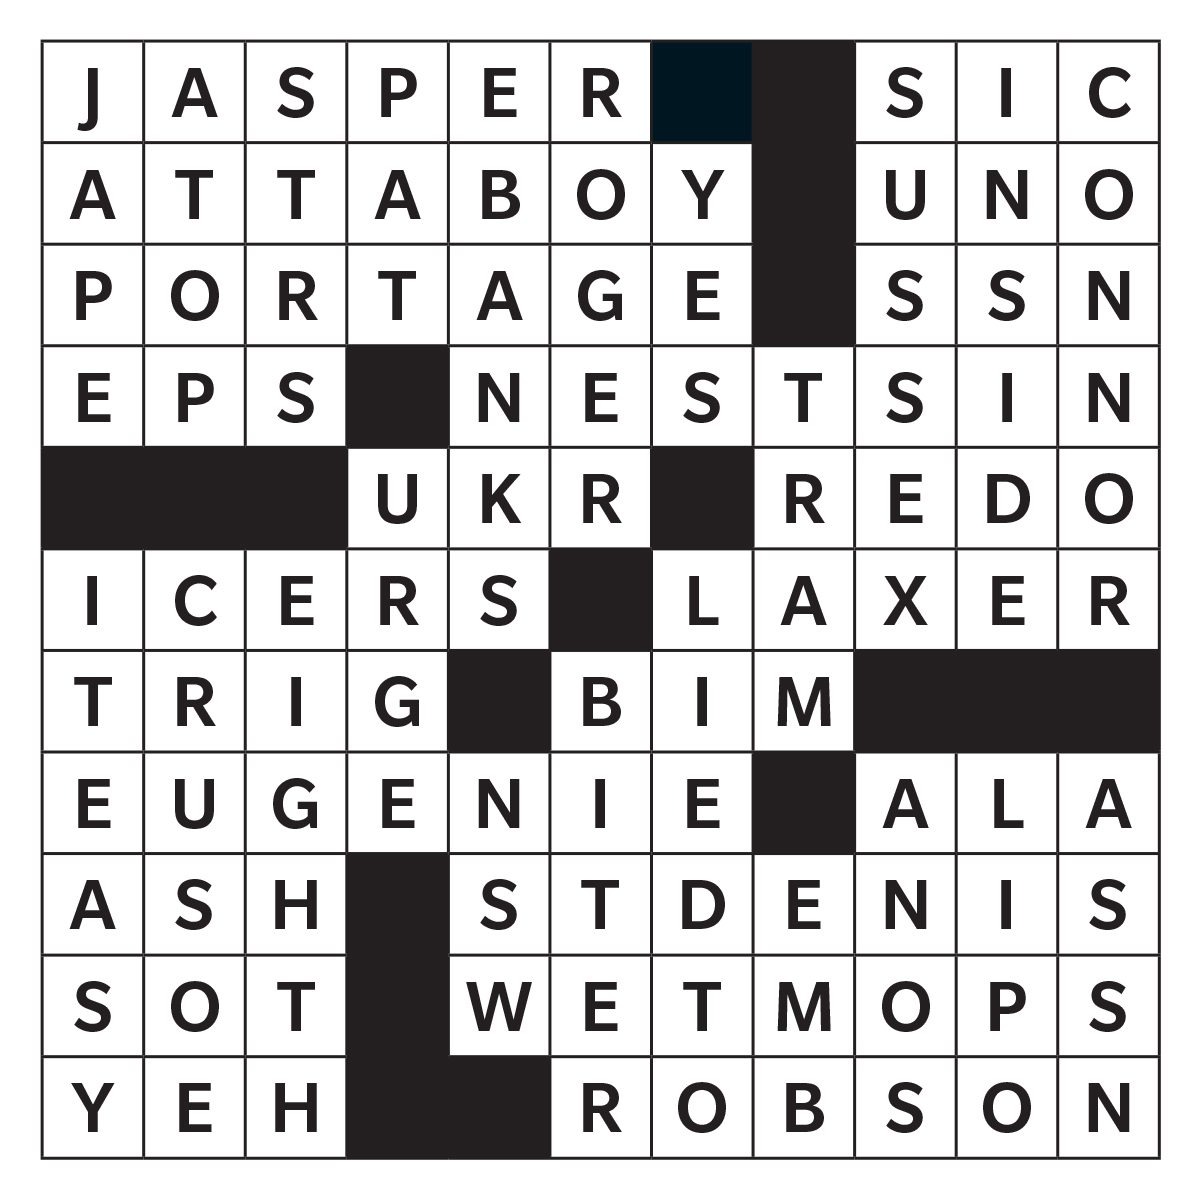 Printable crossword answer - September 2019